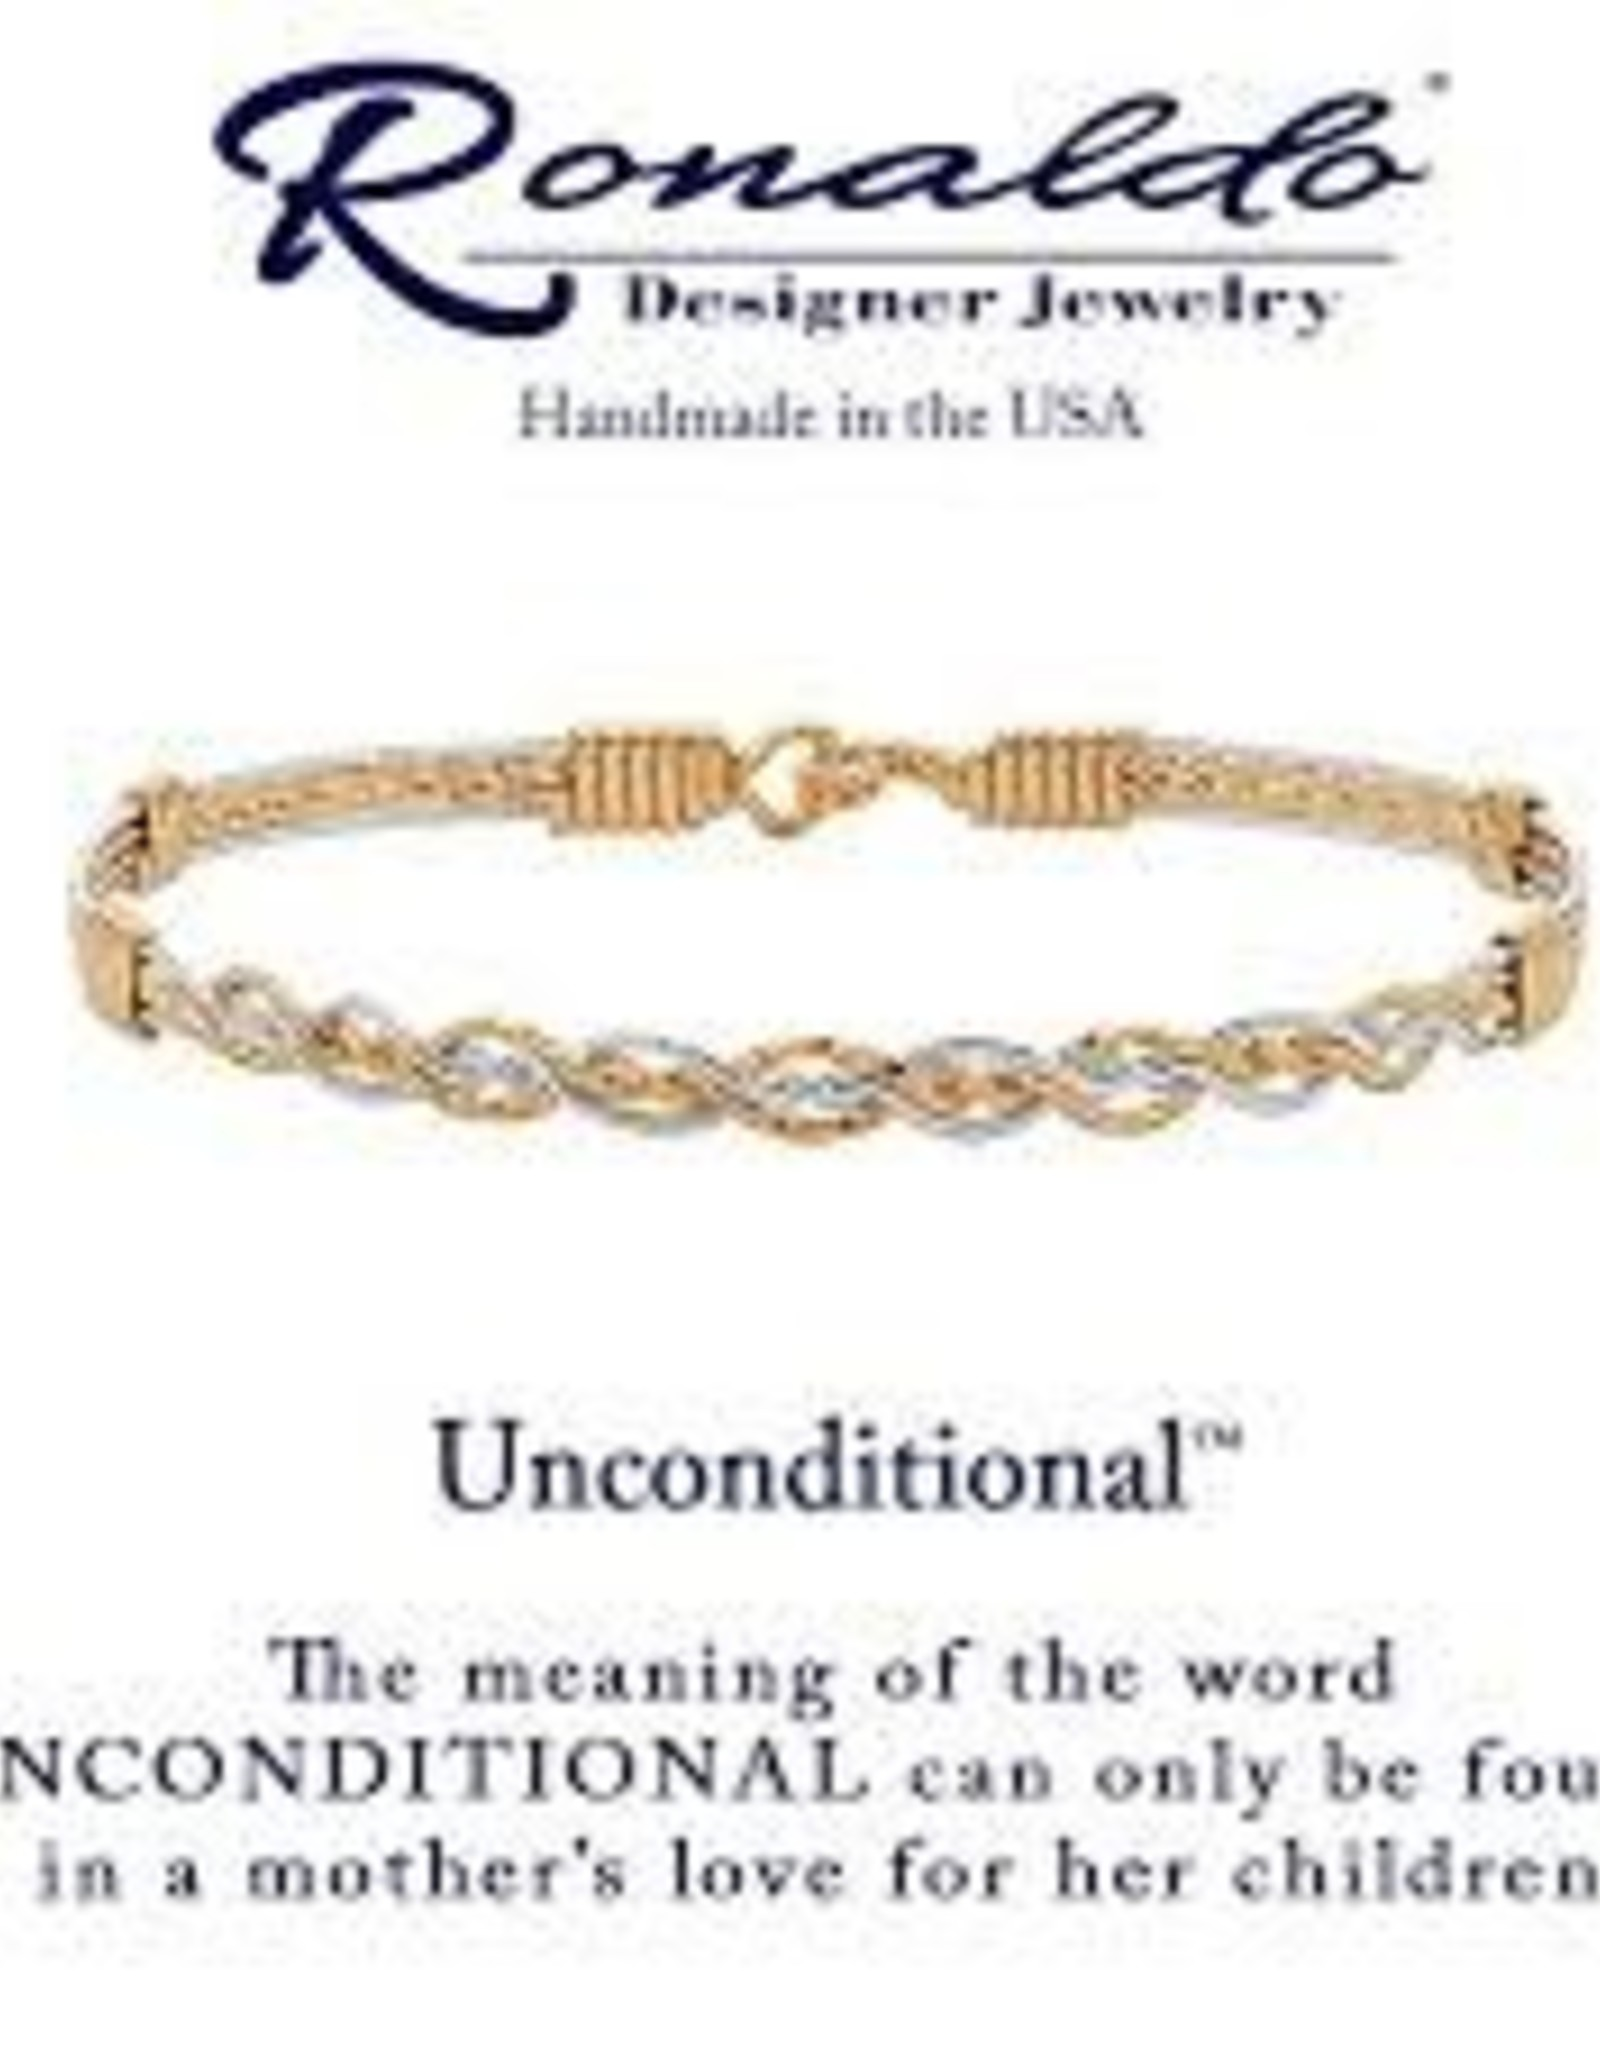 Ronaldo Ronaldo Bracelet-Unconditional Love